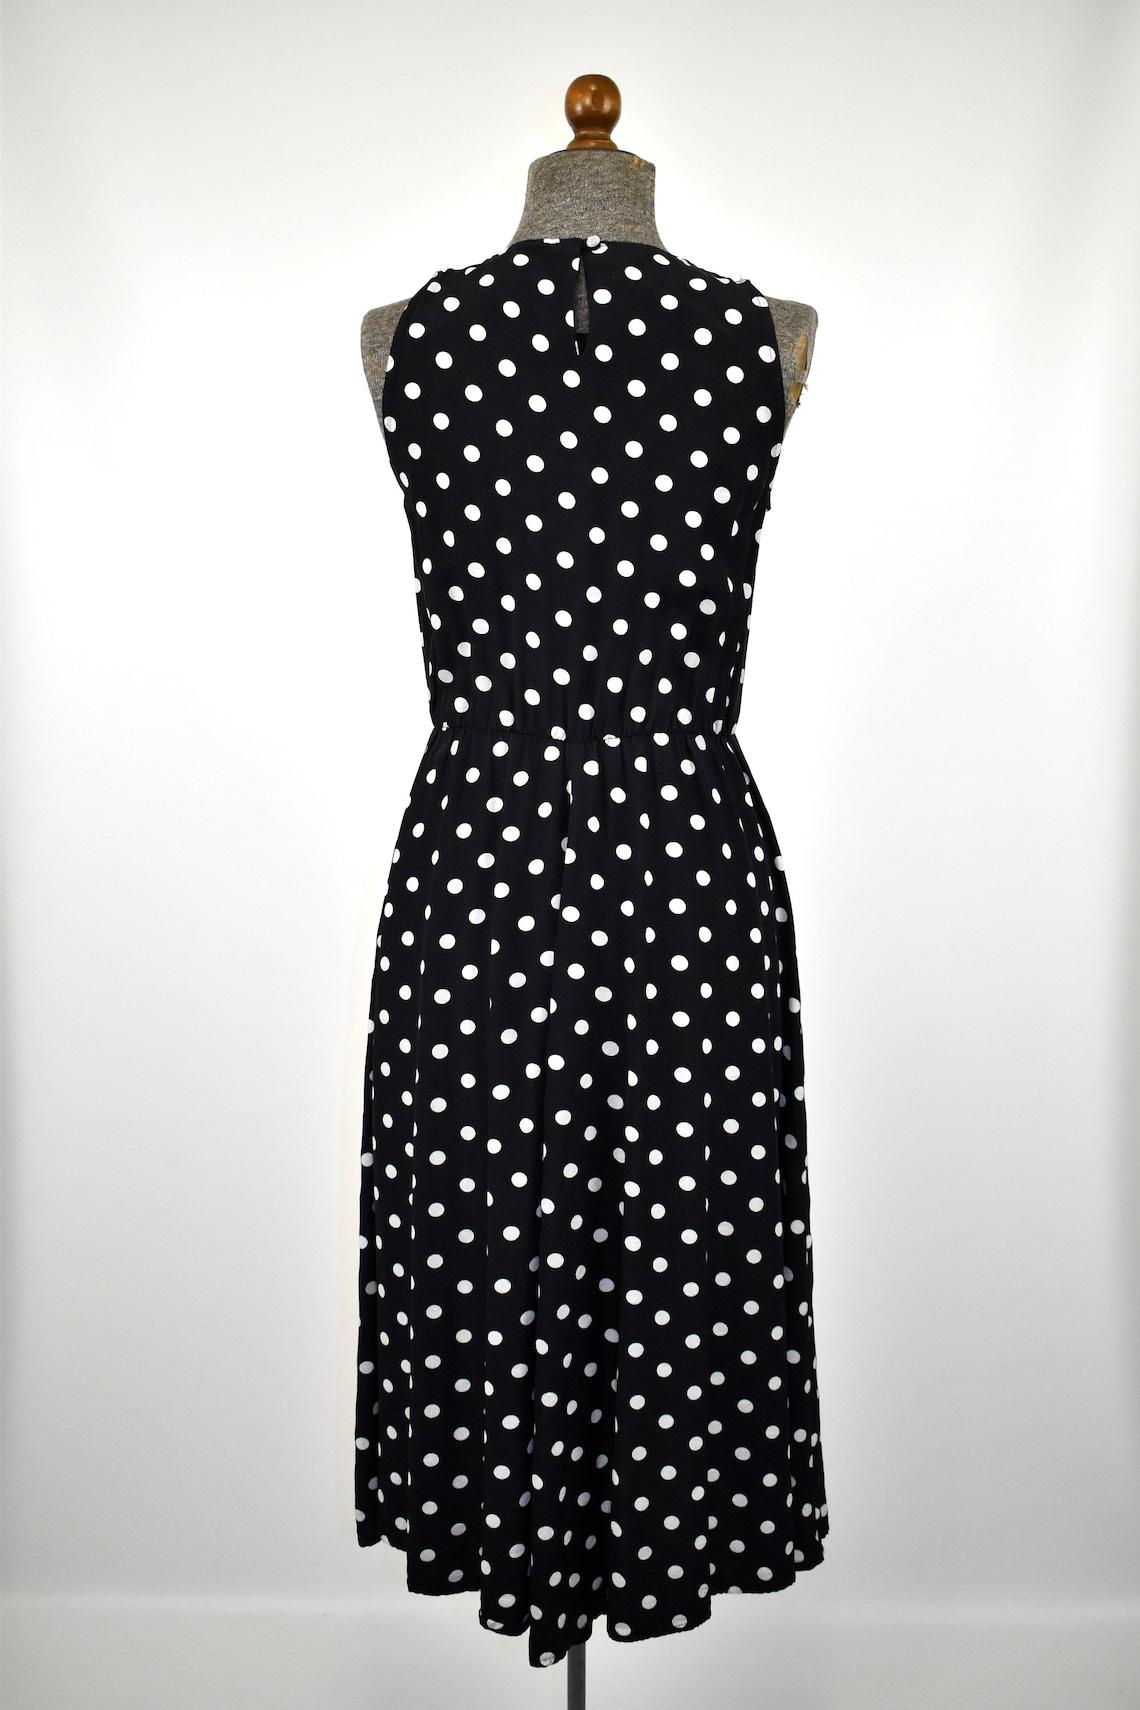 1980s Sleeveless Rayon Black/White Fit and Flare Midi Dress//